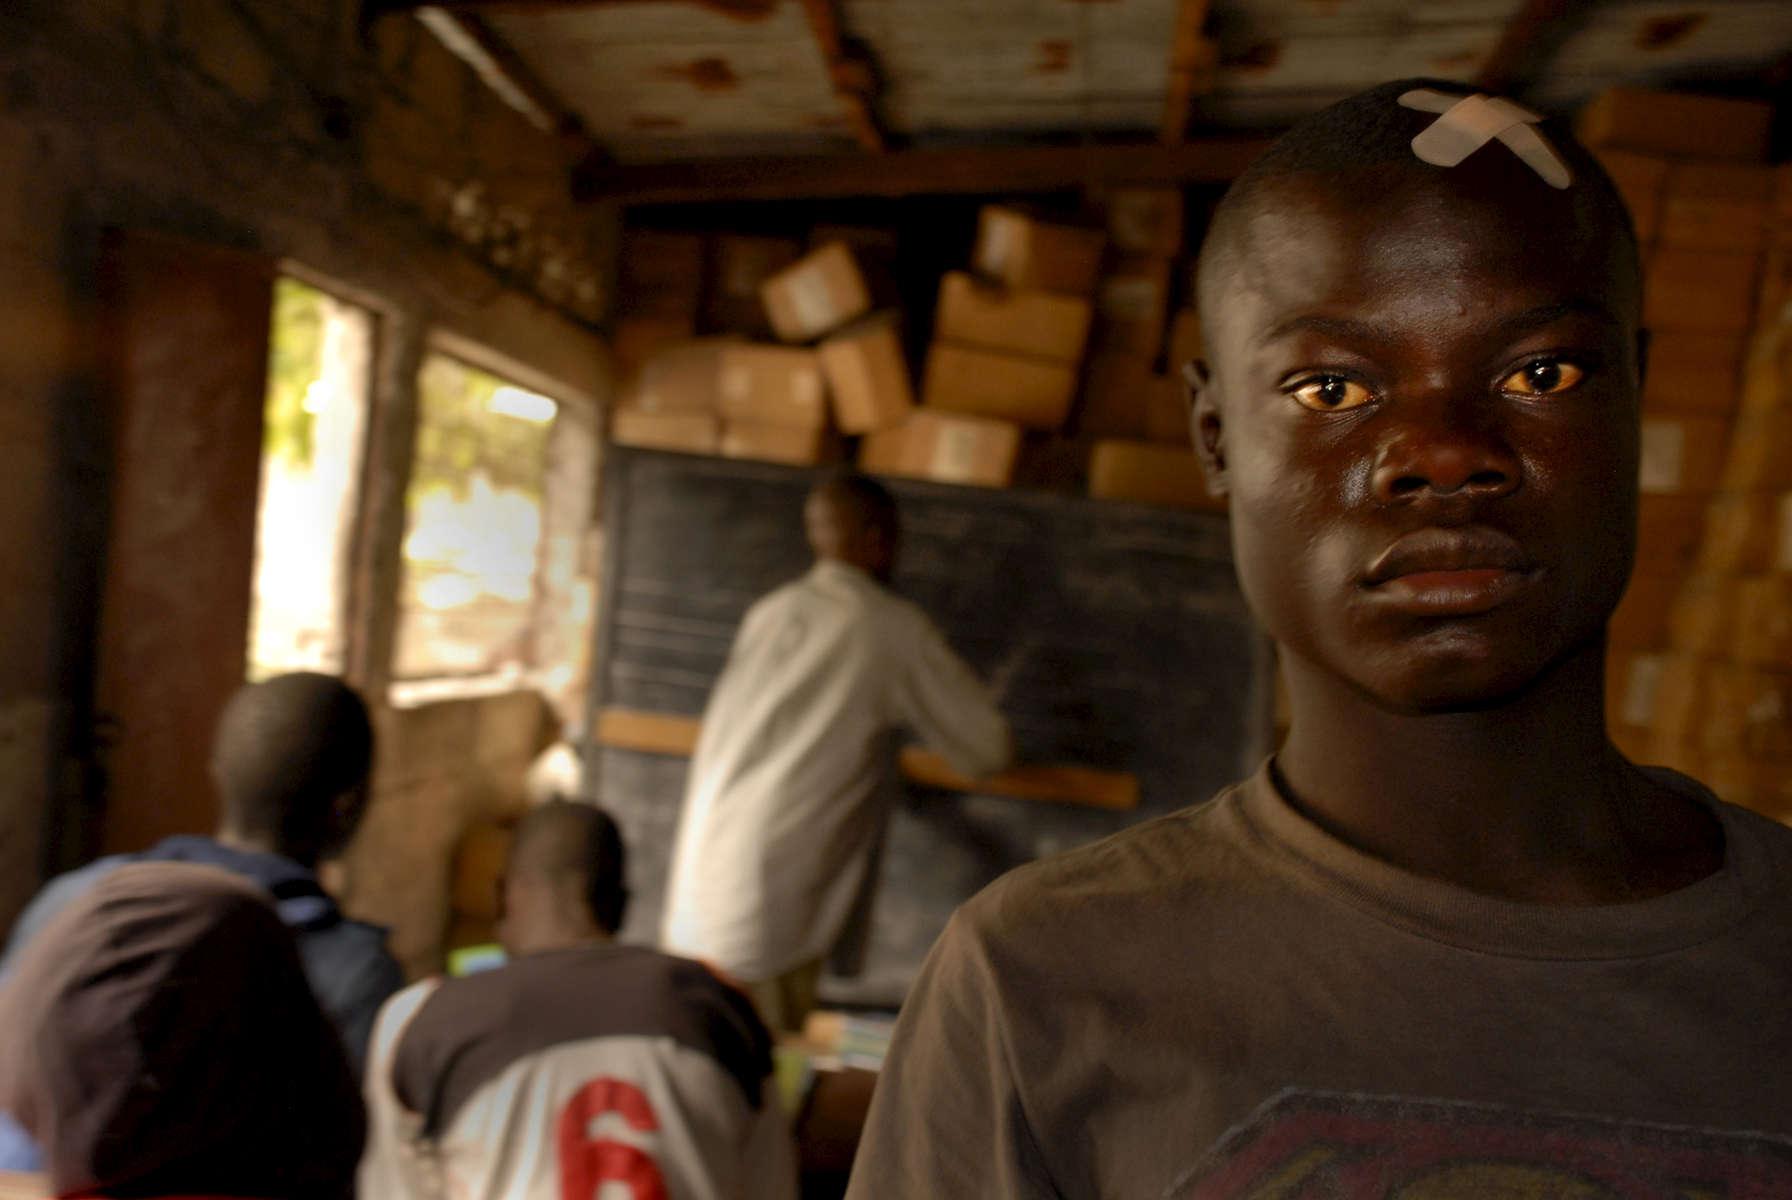 Shwege street kid, Kinshasa, DRCongo 2009